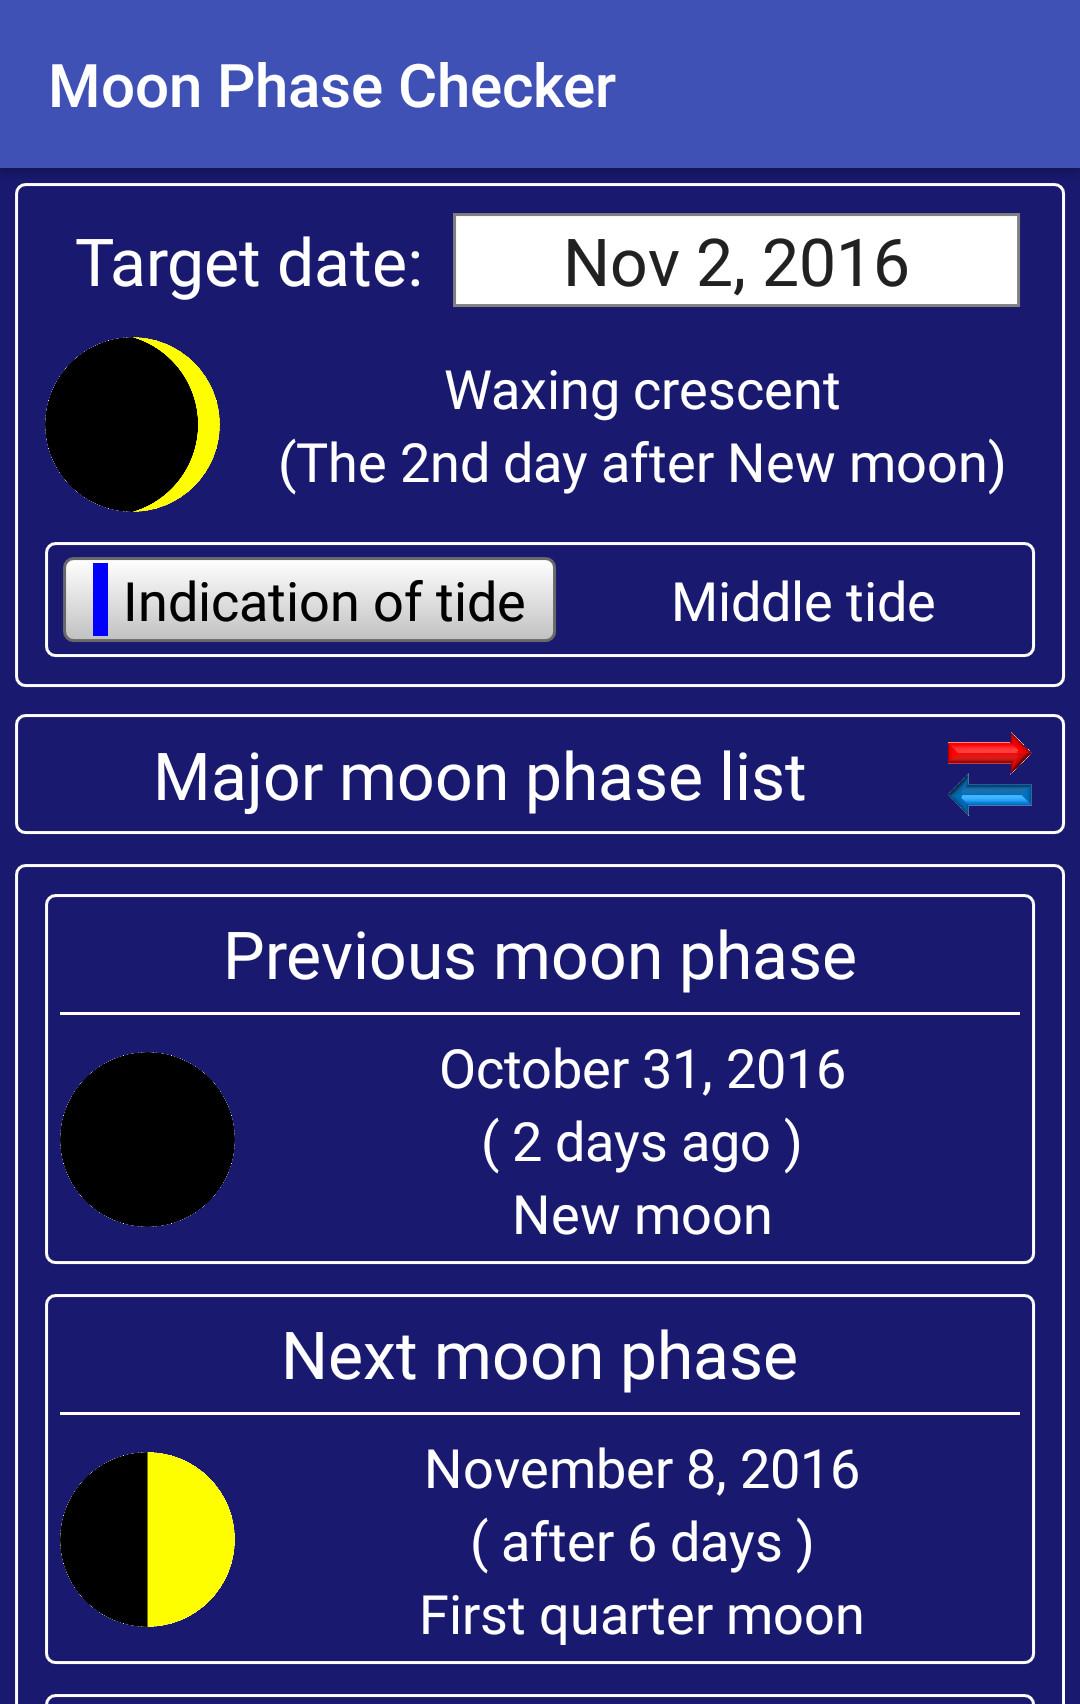 Moon Phase Checker